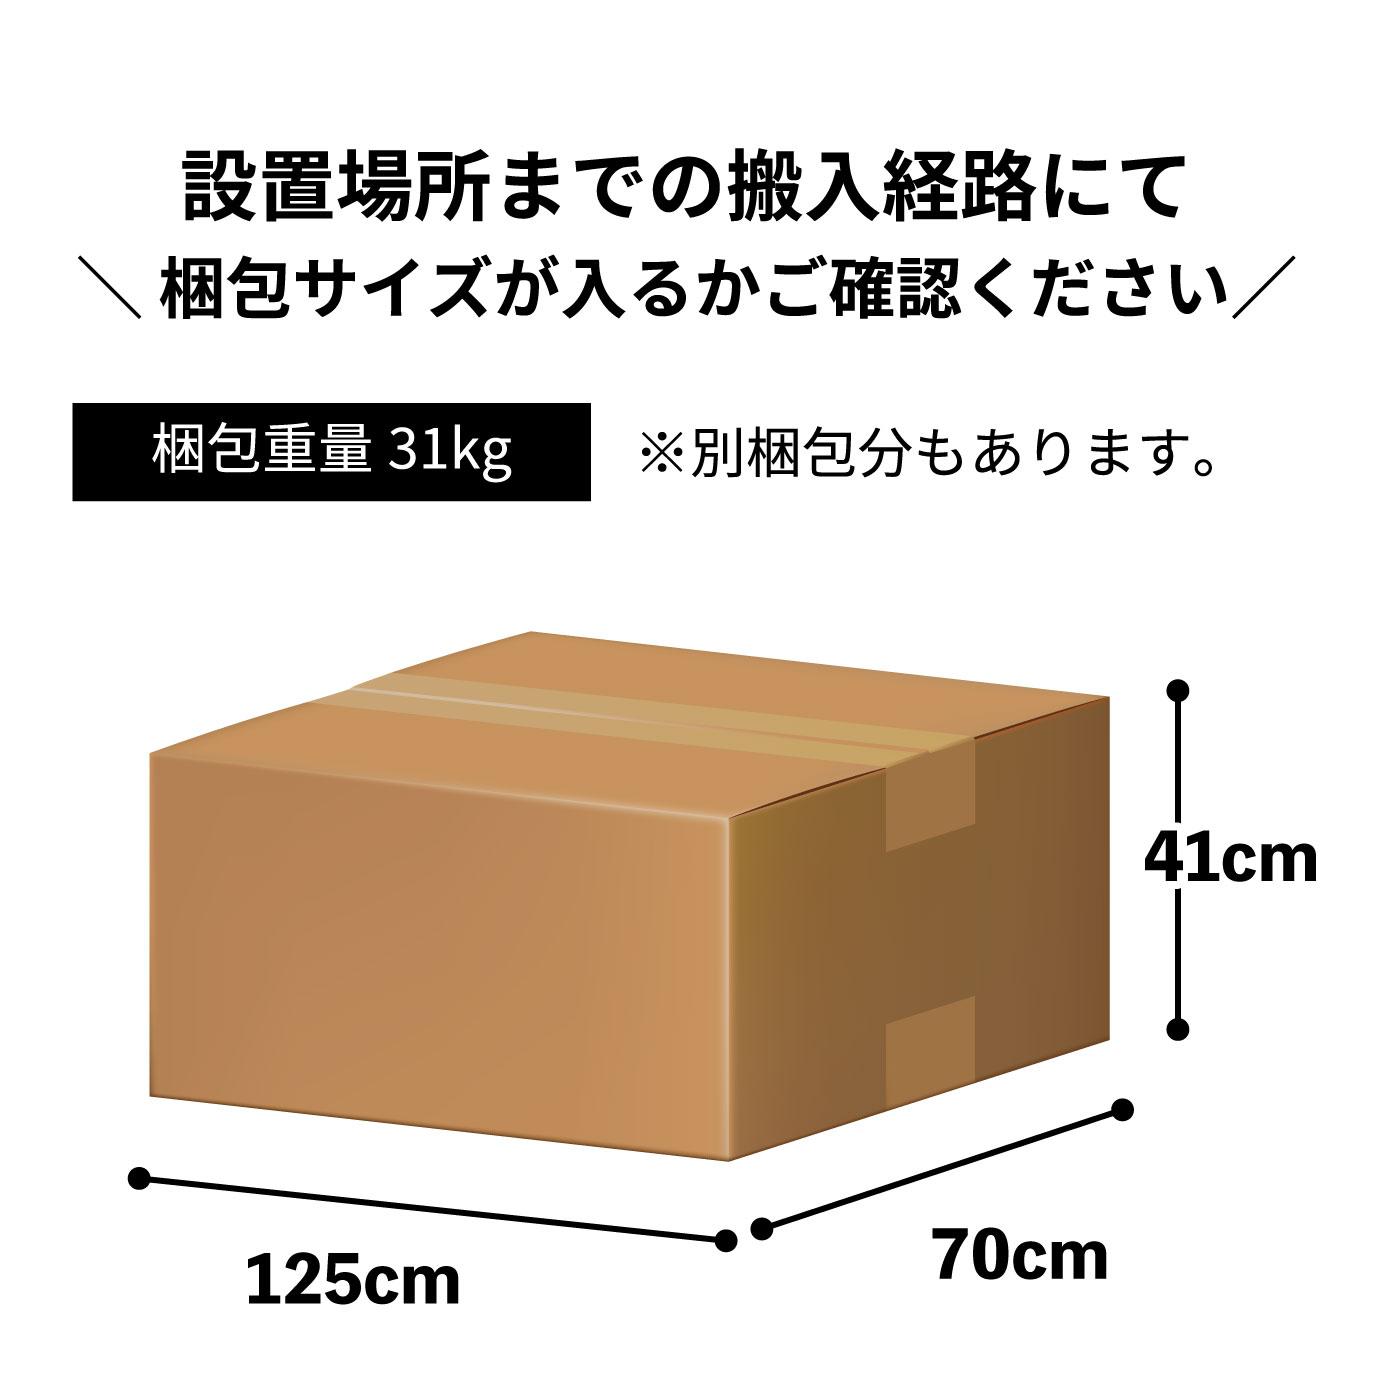 DK-1206の梱包サイズ